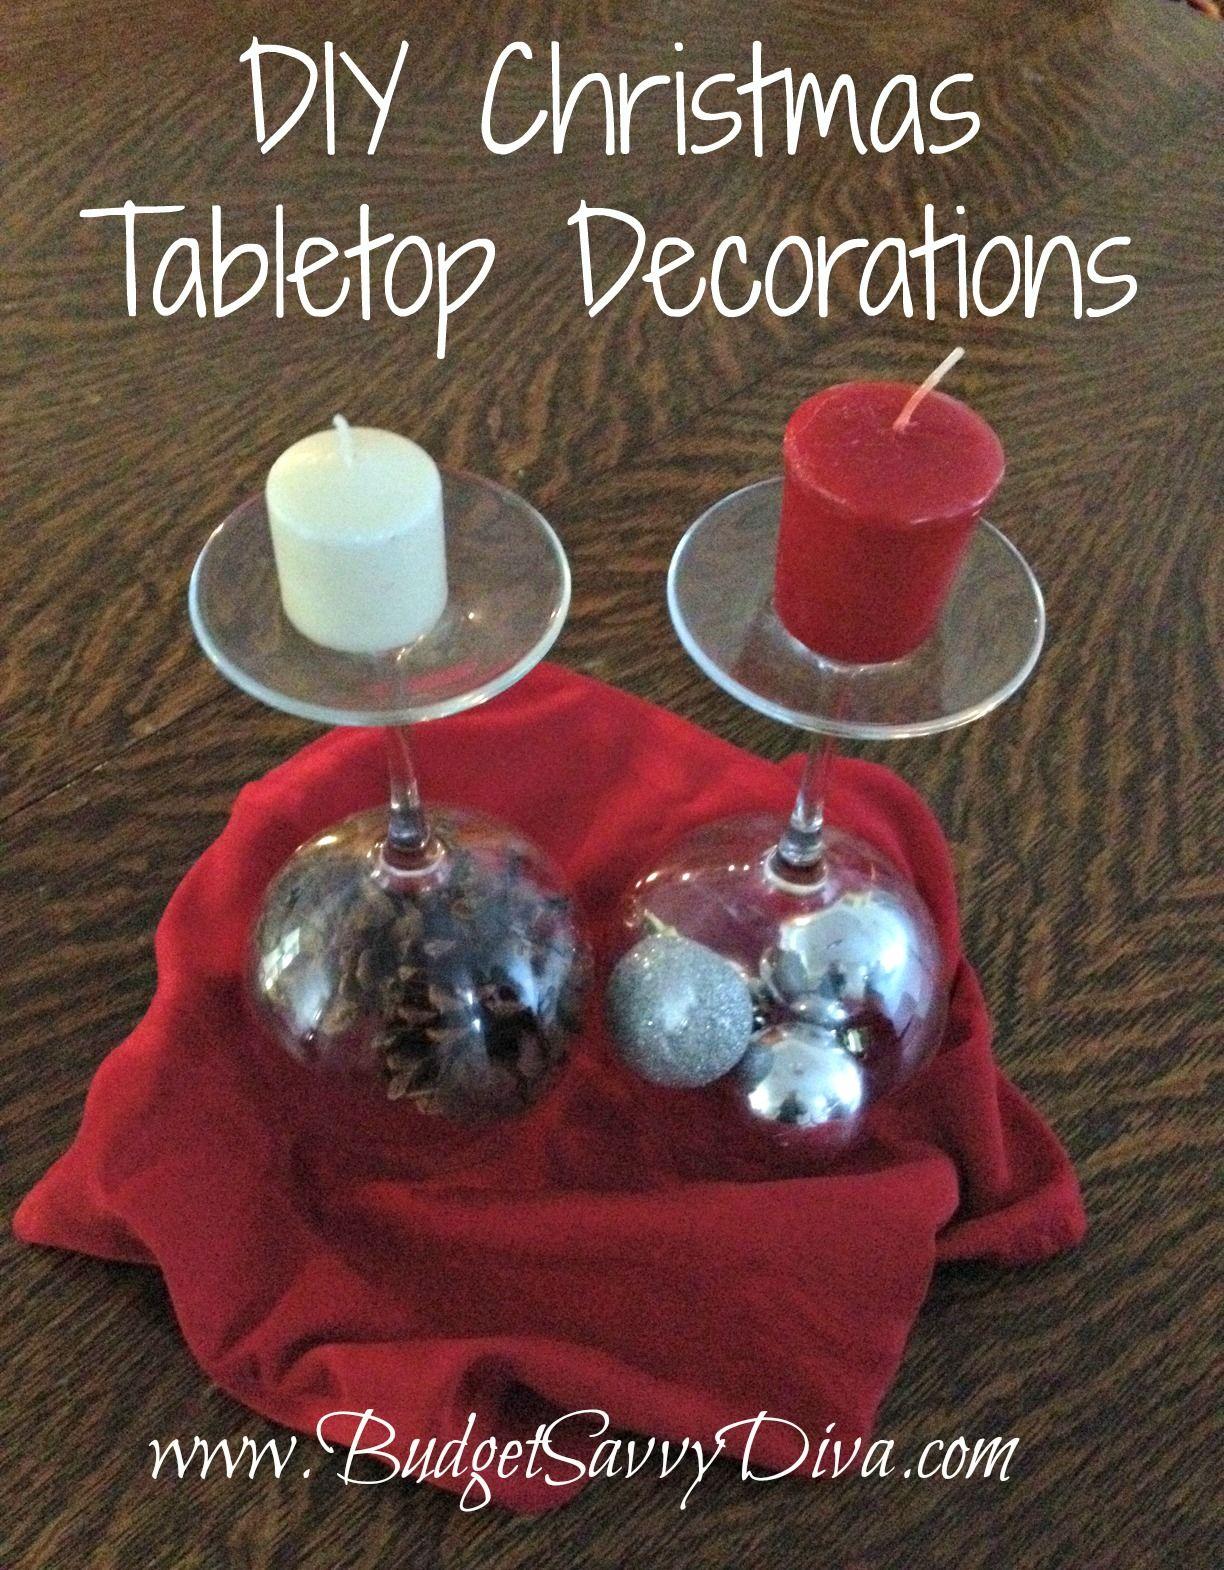 Diy Christmas Decorations Using Wine Glass And Candles Christmas Decor Diy Diy Christmas Pictures Christmas Candles Diy